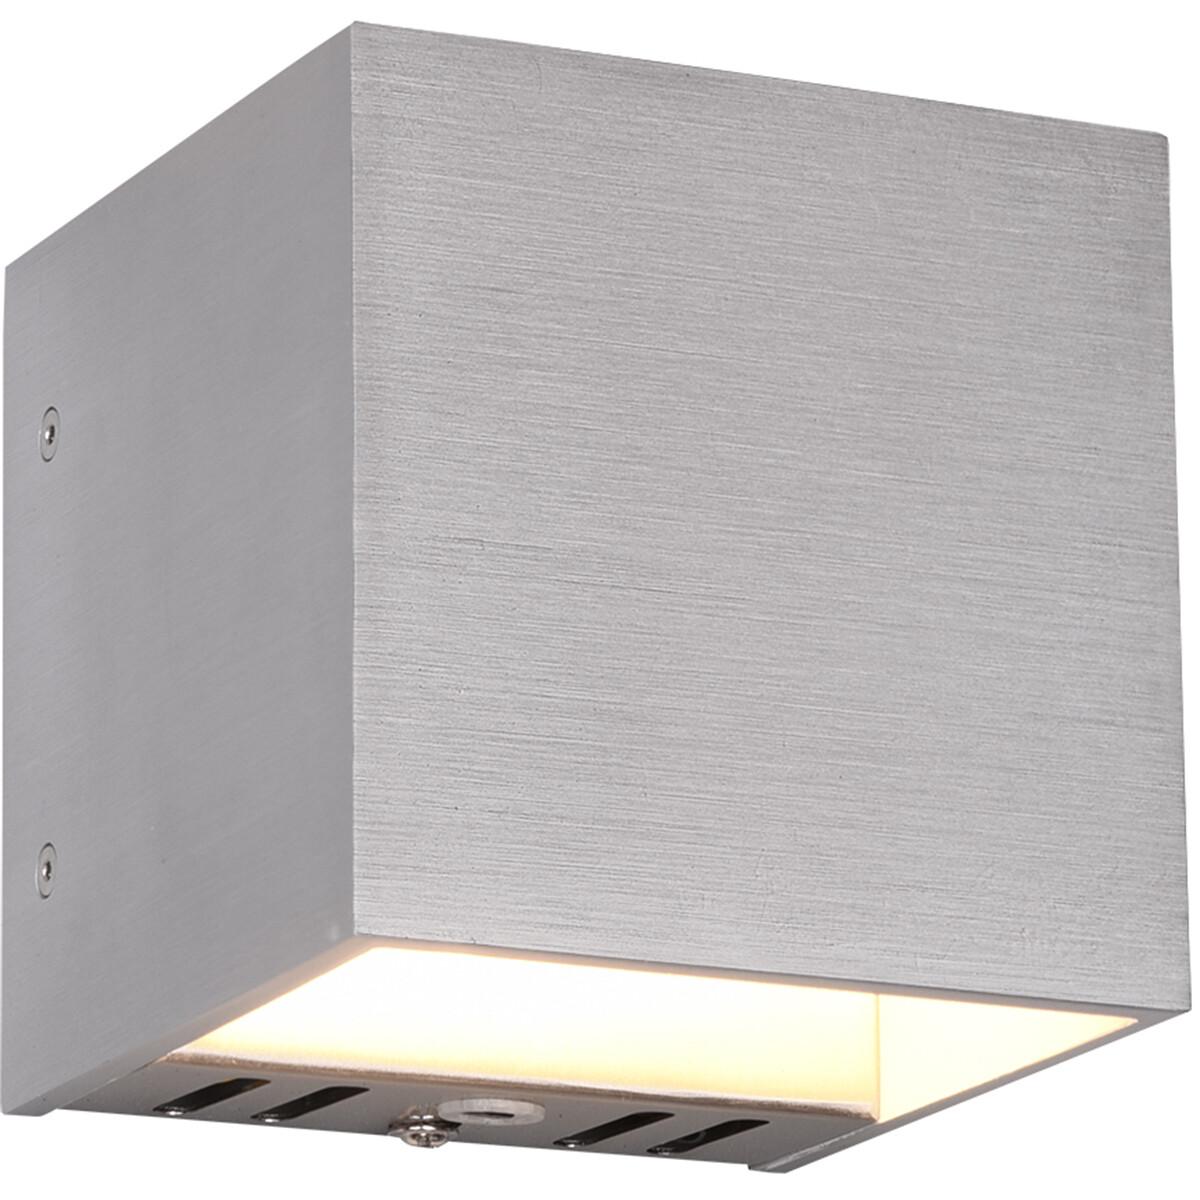 LED Wandlamp WiZ - Smart LED - Trion Figlio - 5W - Aanpasbare Kleur - RGBW - Vierkant - Mat Grijs -